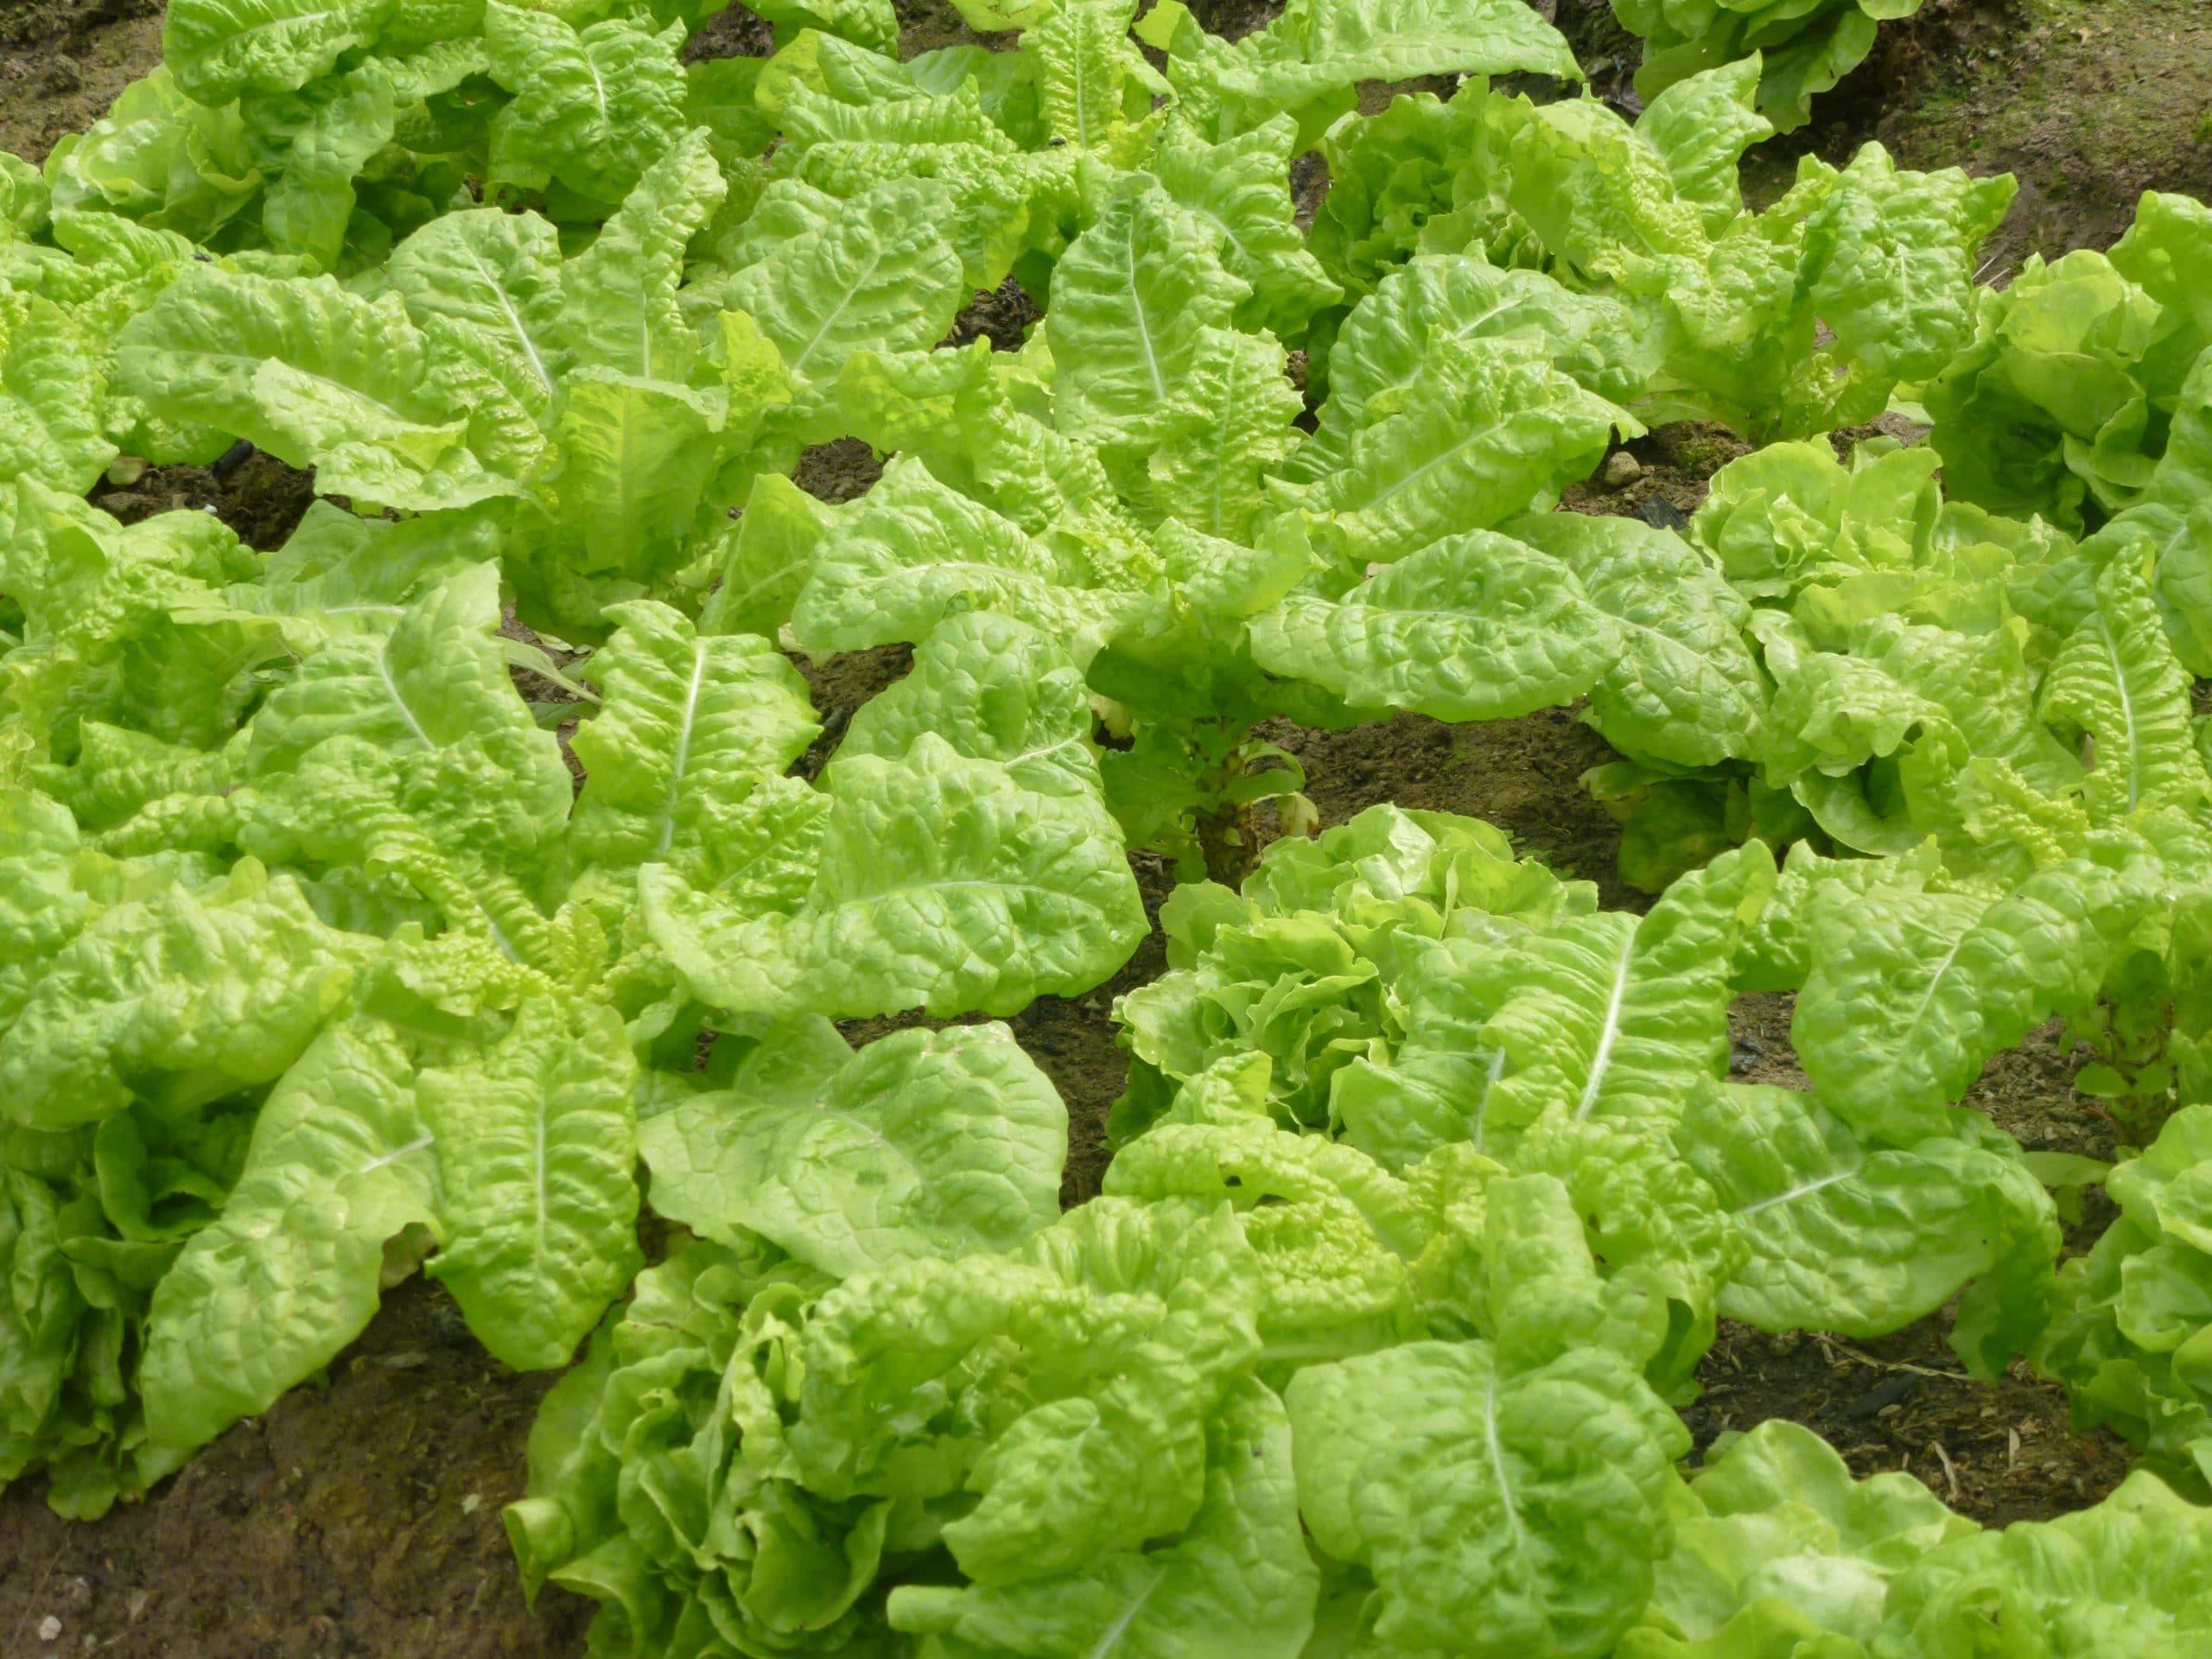 La lechuga romana es una planta muy popular